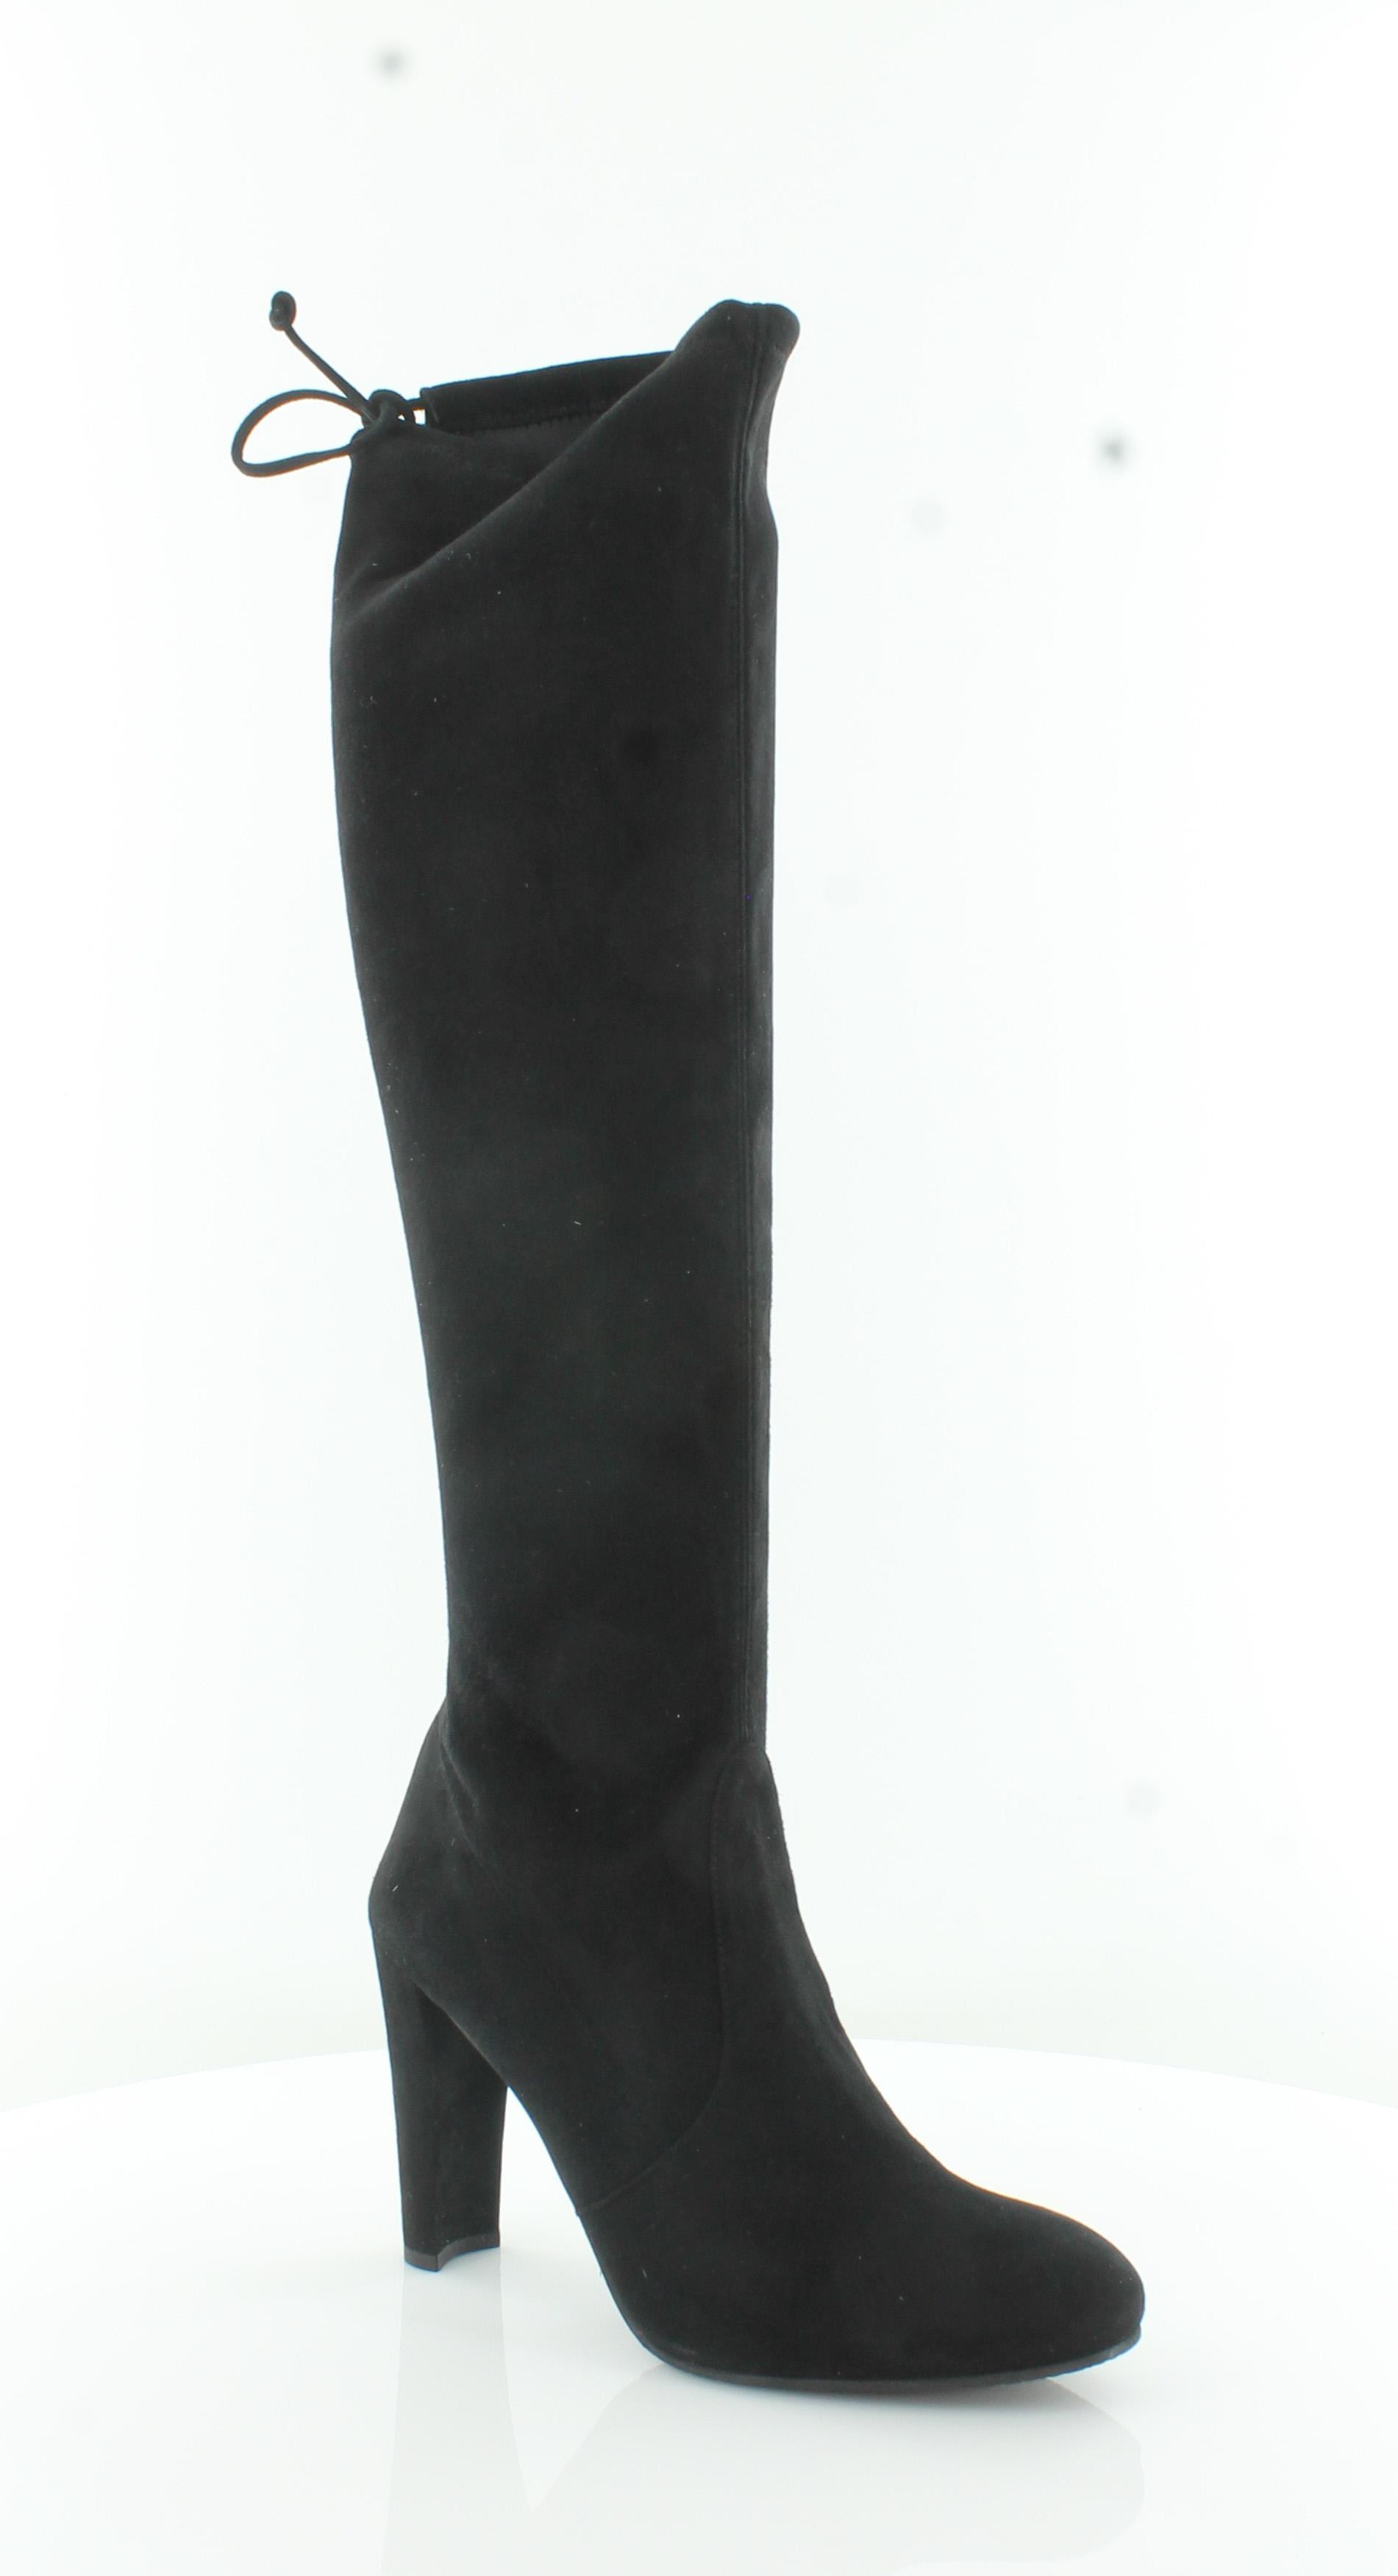 ccdf51fd816 Stuart Weitzman Keenland Women s Boots Black